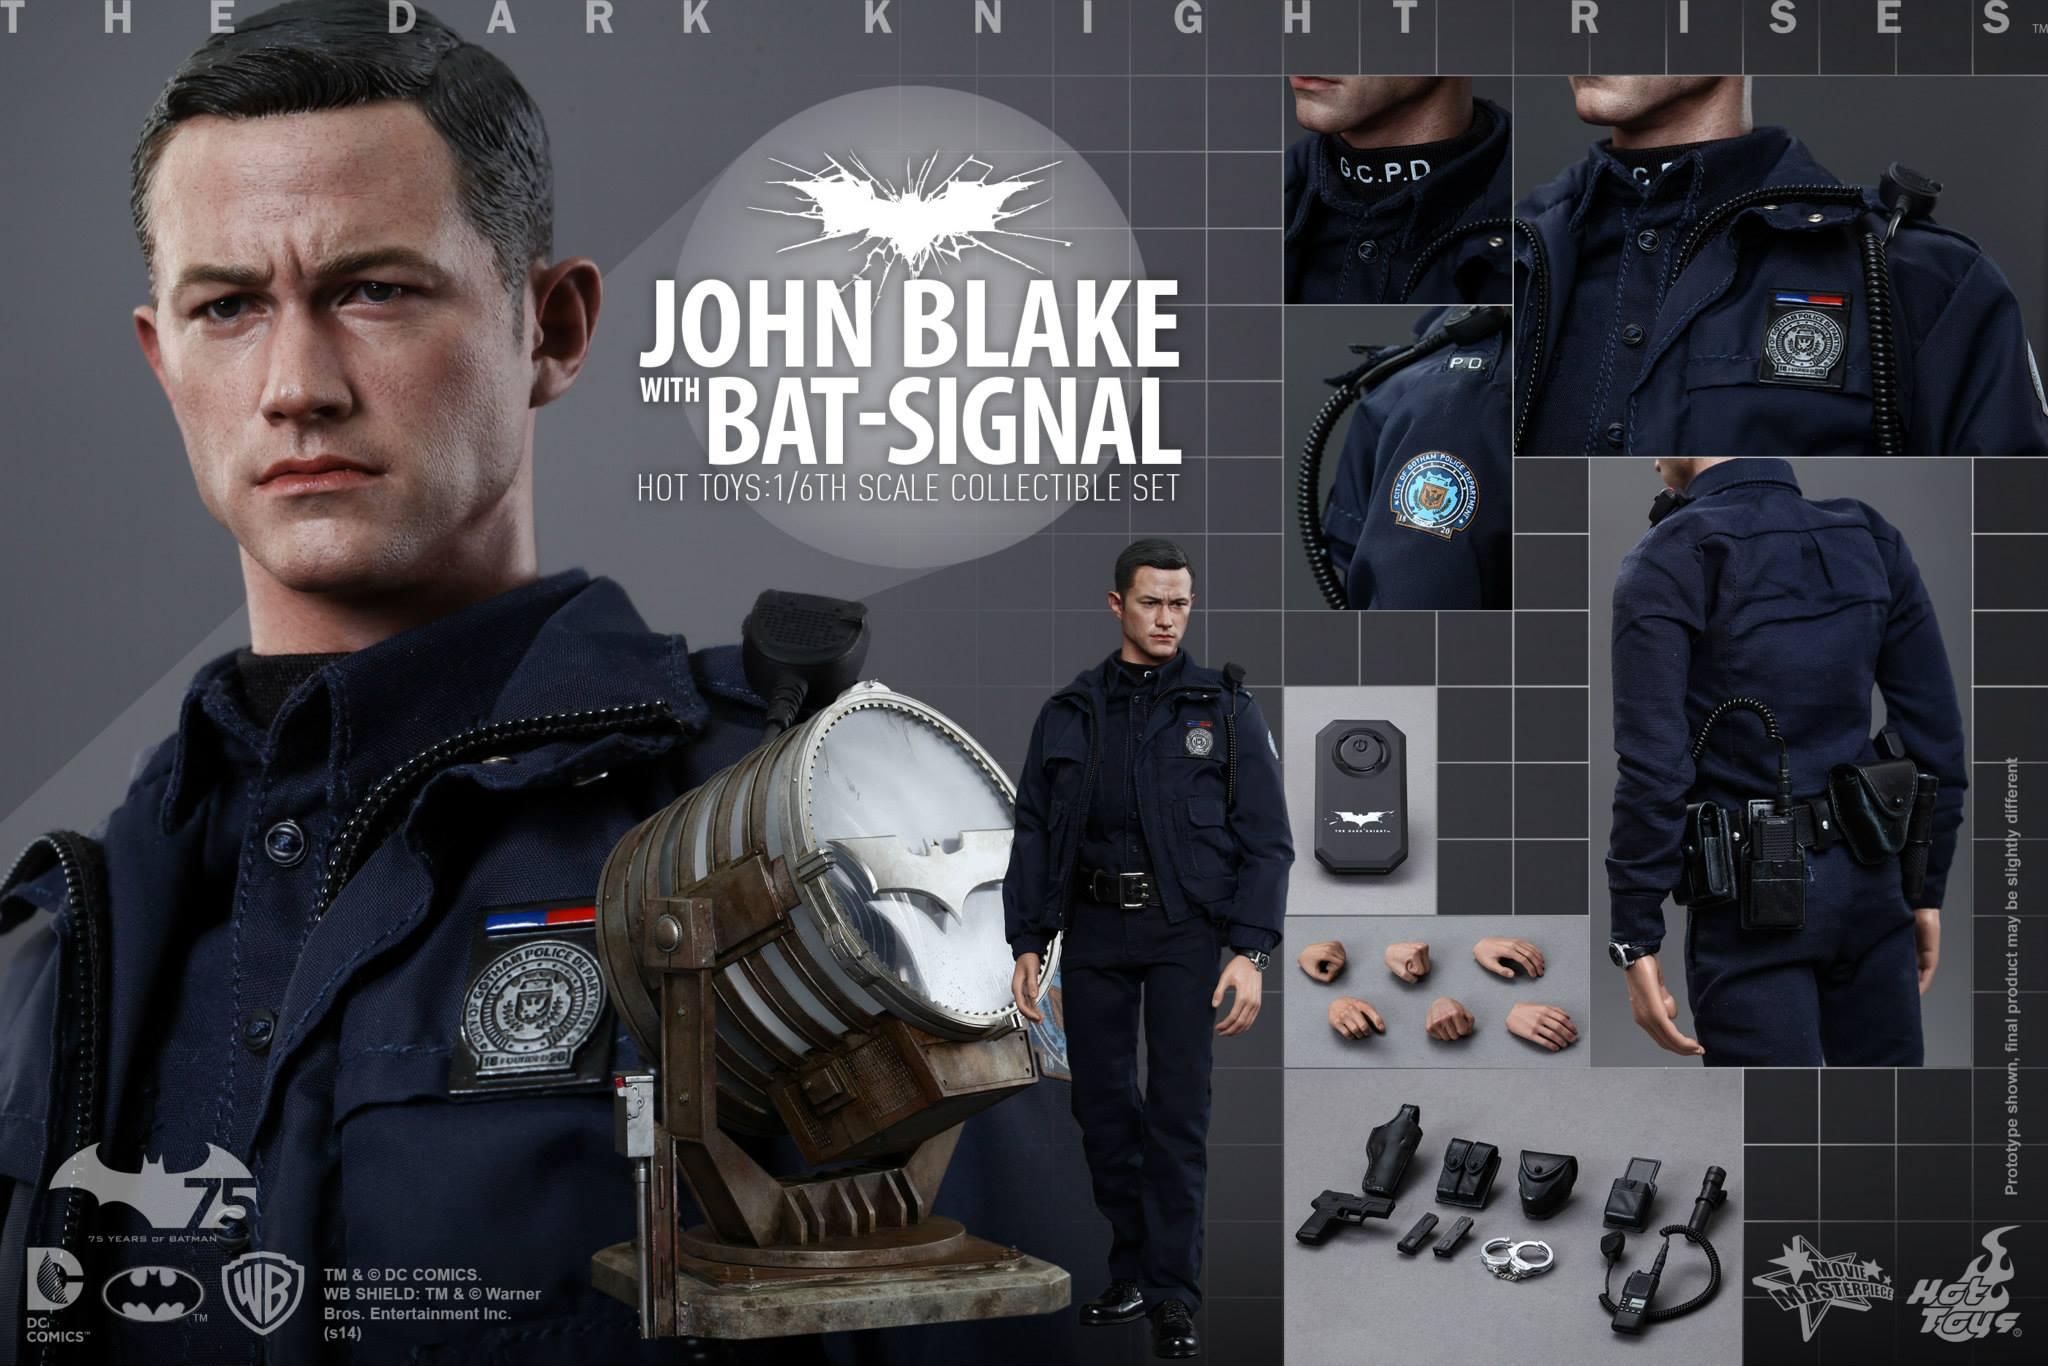 THE DARK KNIGHT RISES - Lt. JIM GORDON & JOHN BLAKE w/BATSIGNAL 345400109